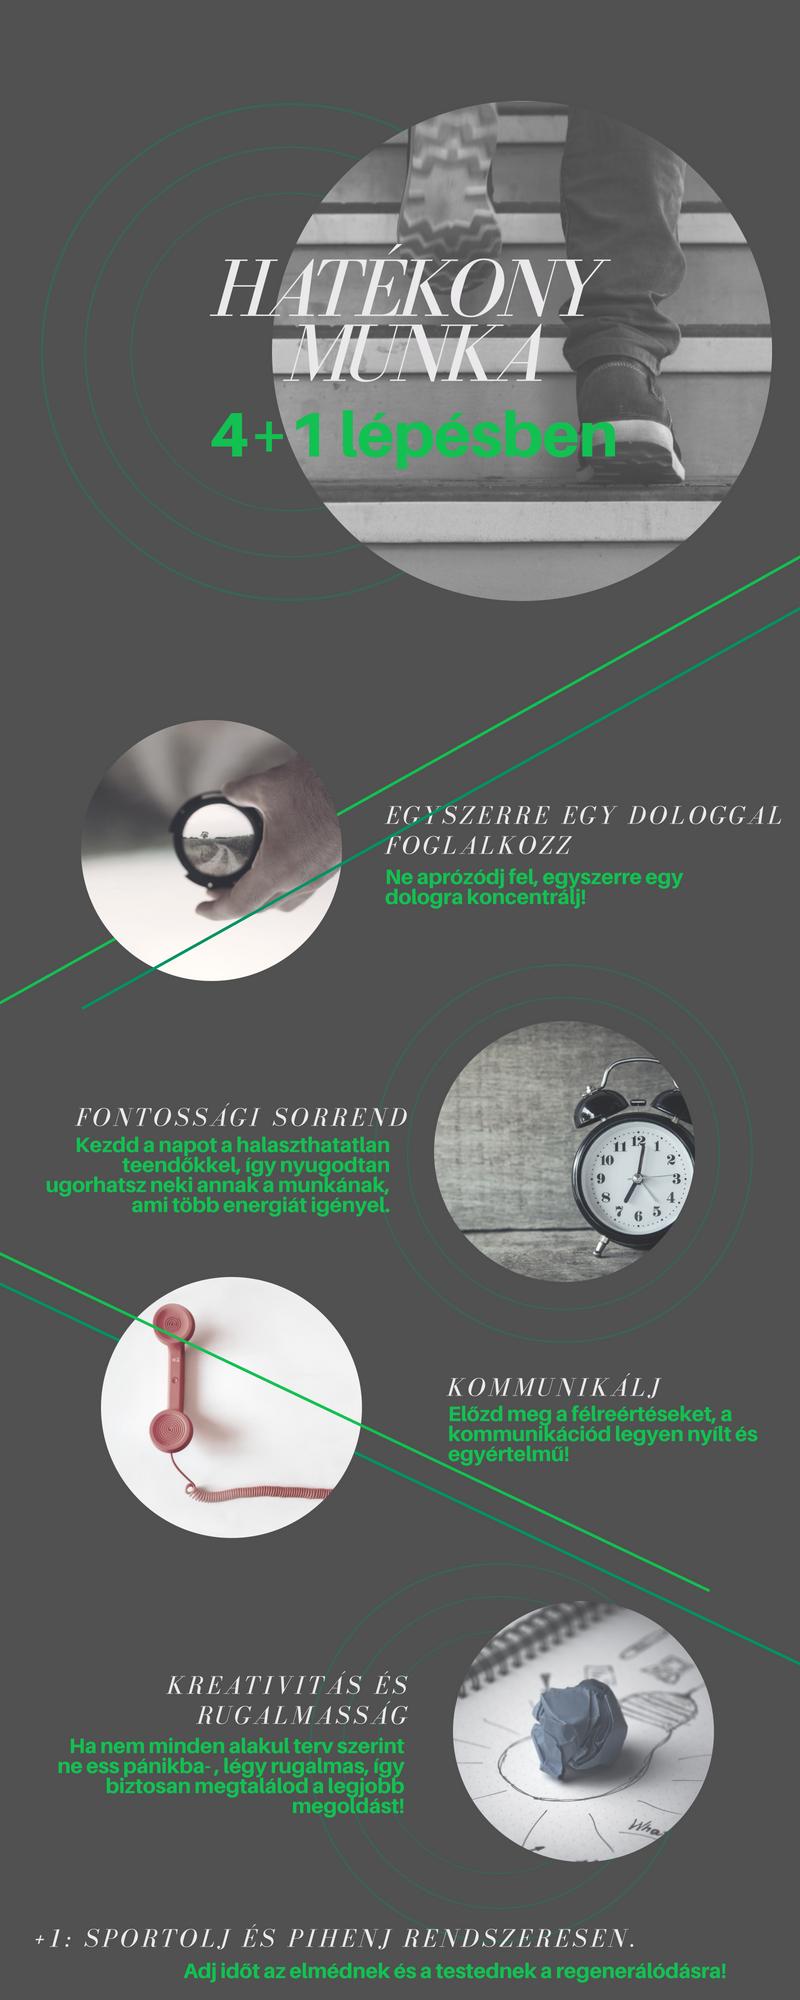 hatékony_munkavegzes_infografika